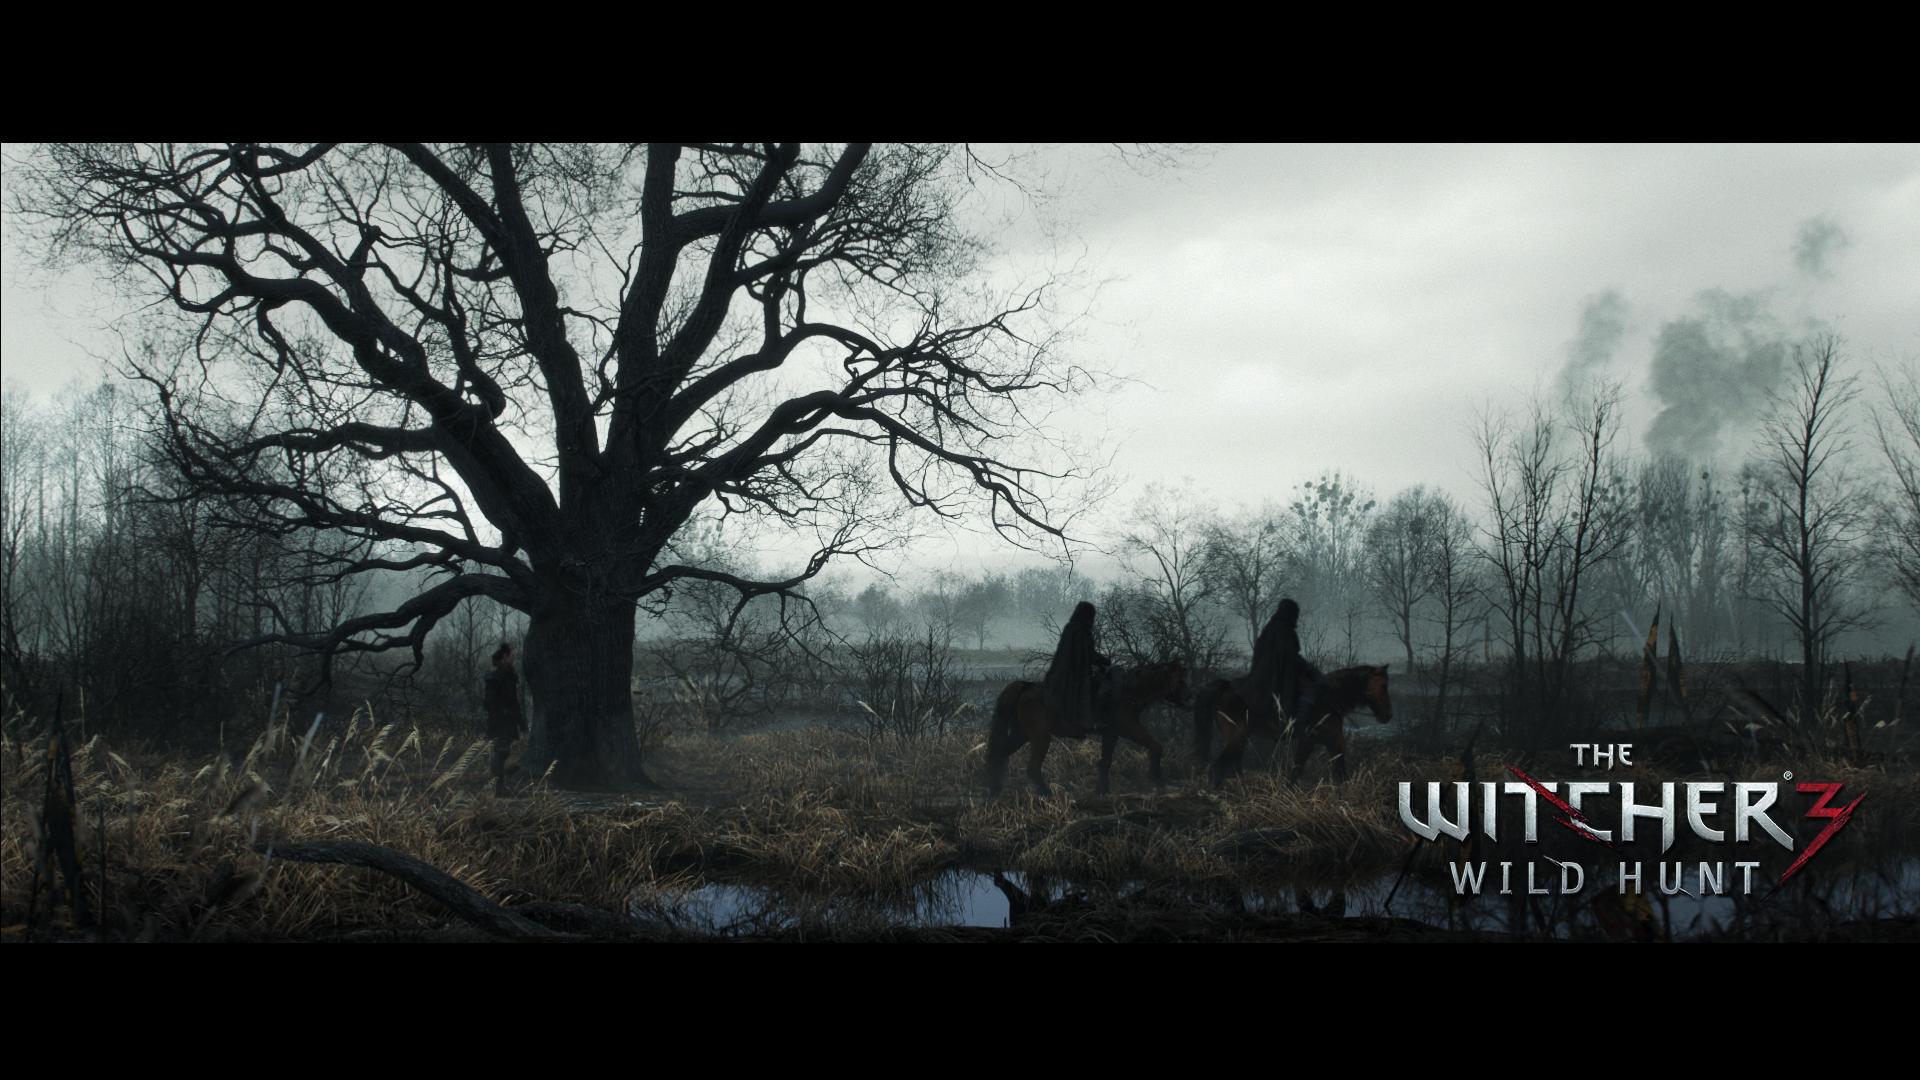 The Witcher 3 Wild Hunt Hd Wallpaper 2178406 Zerochan Anime